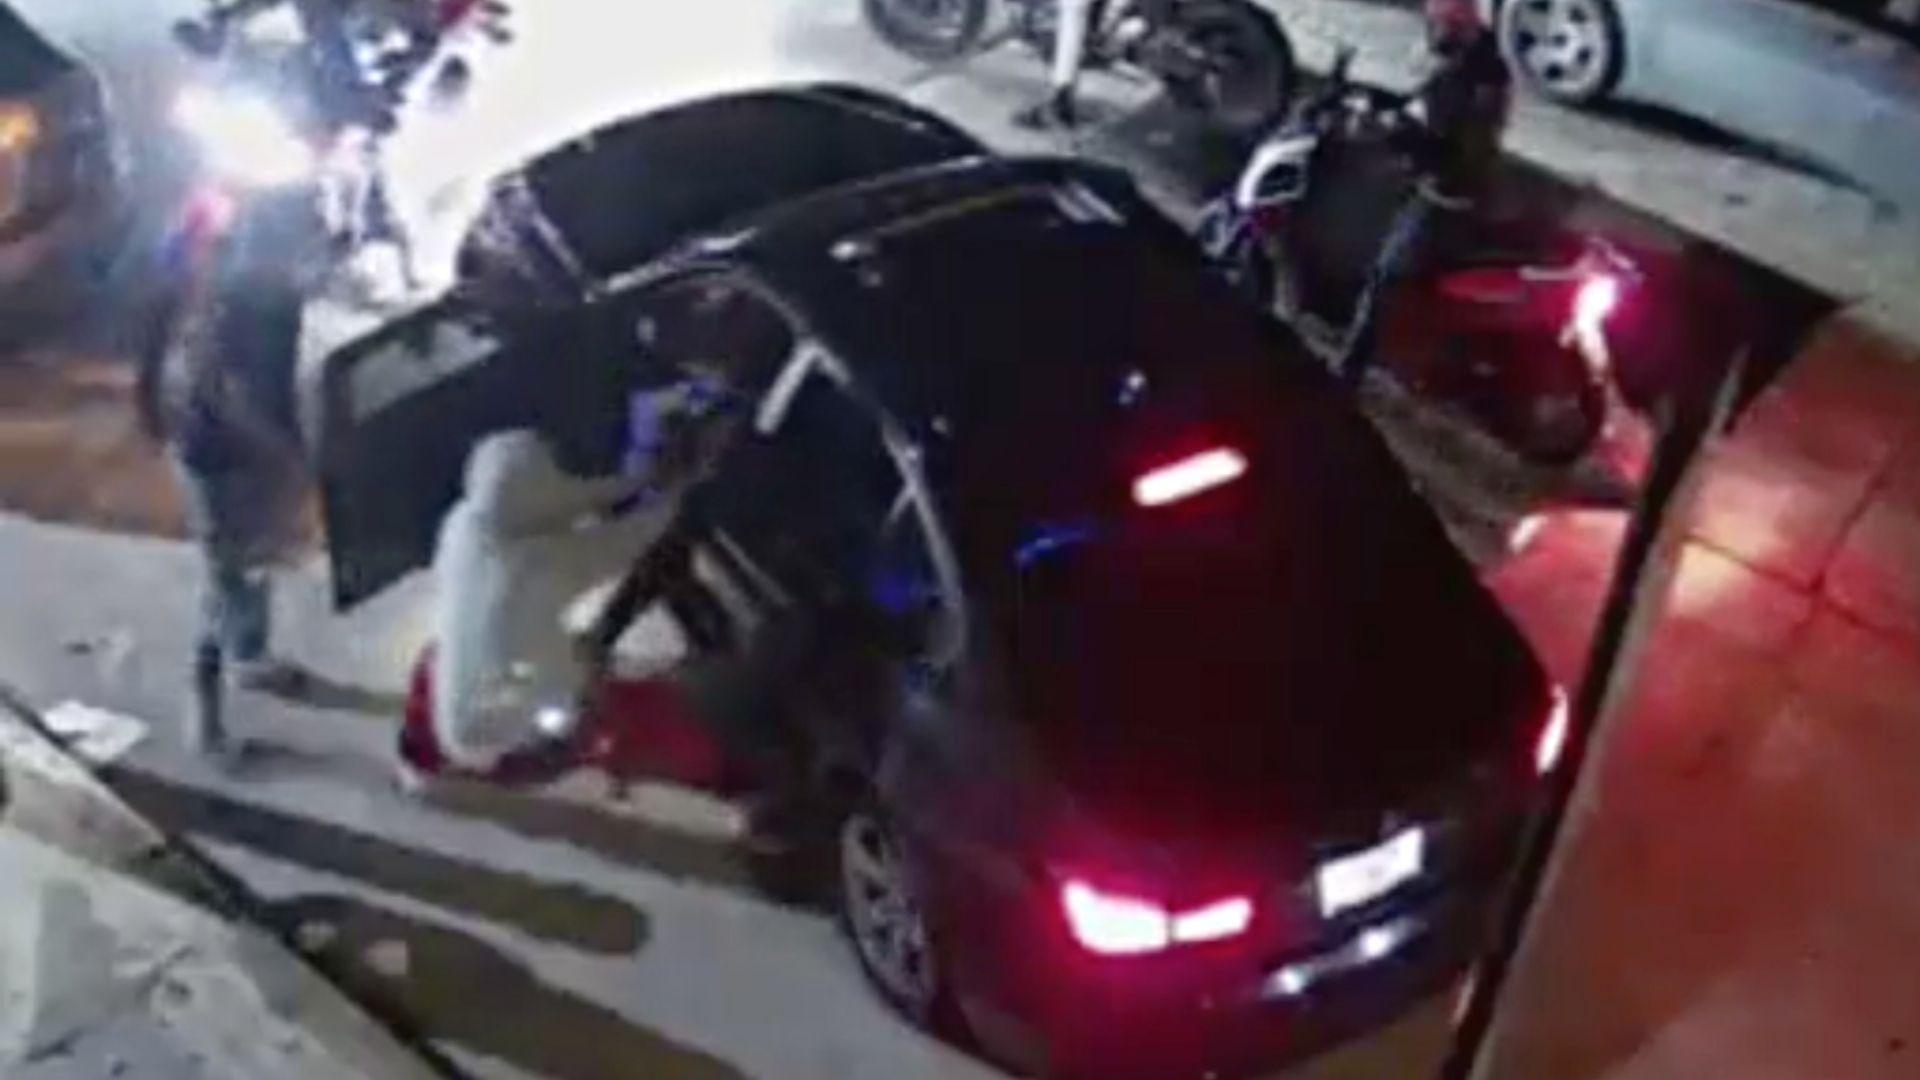 Inwood gunpoint carjacking